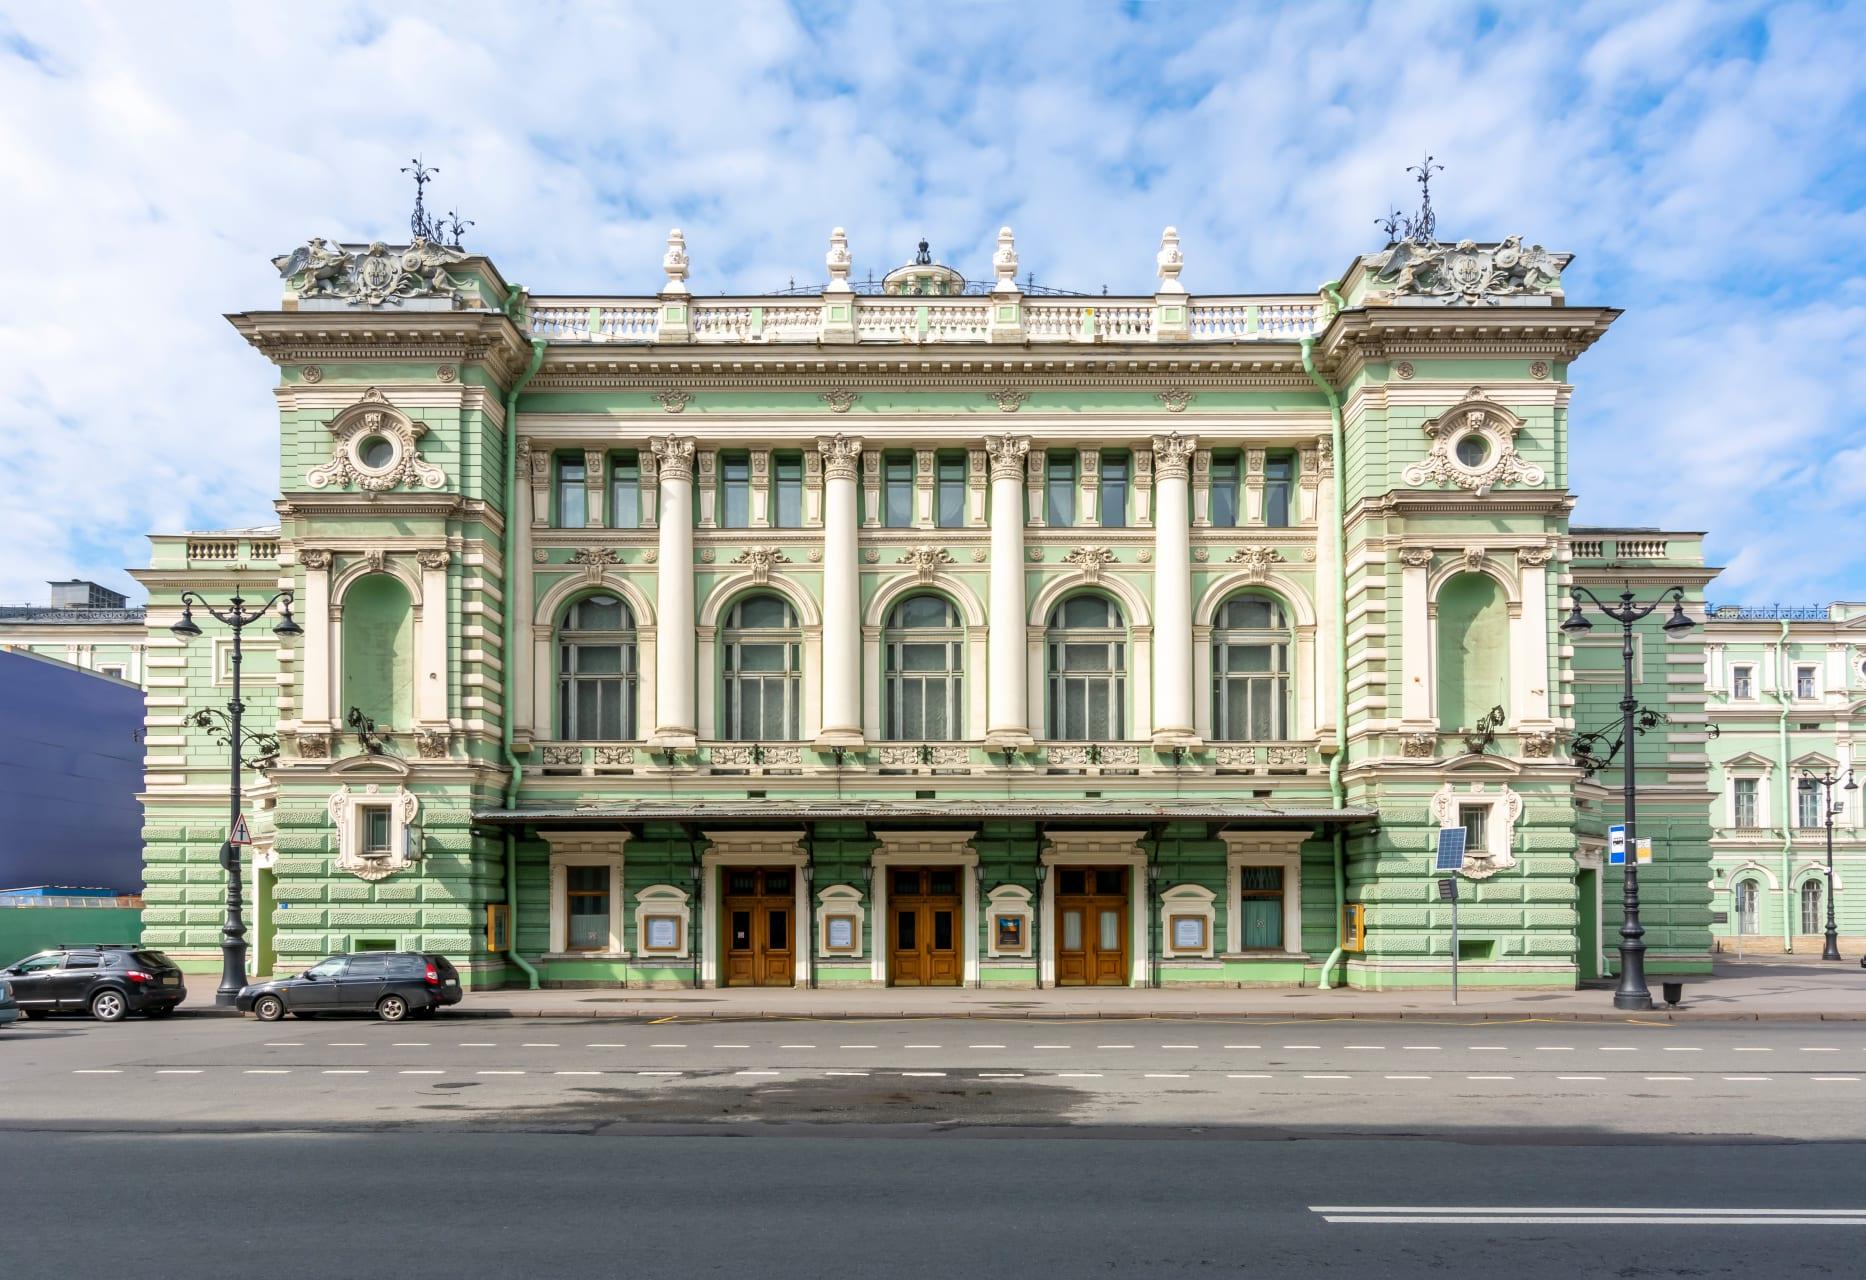 Saint Petersburg - The Magnificent Mariinsky Theater